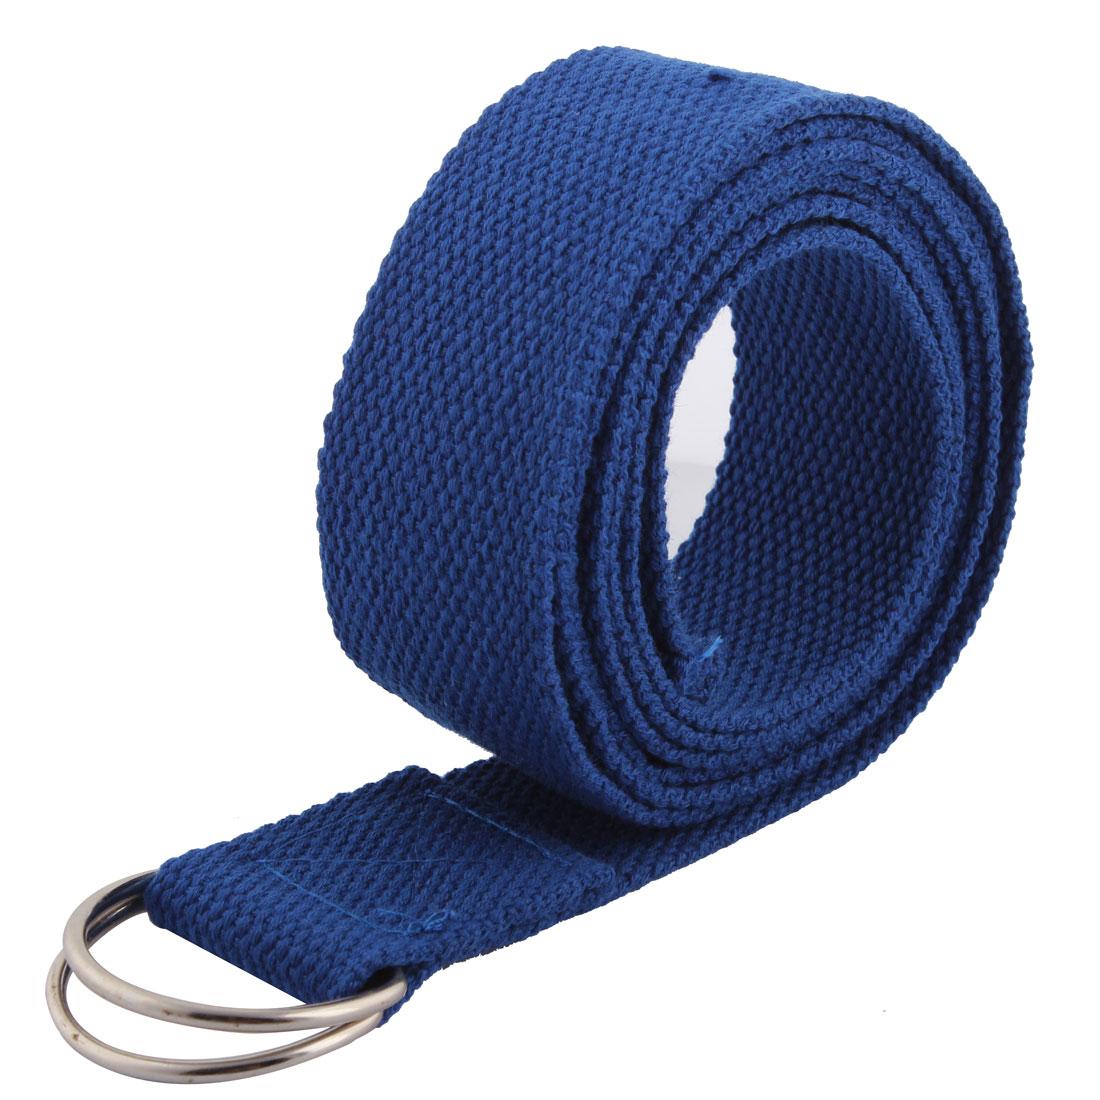 Yoga Fitness Training Sport Fibre Resistance Bands Dark Blue 1.8M Long